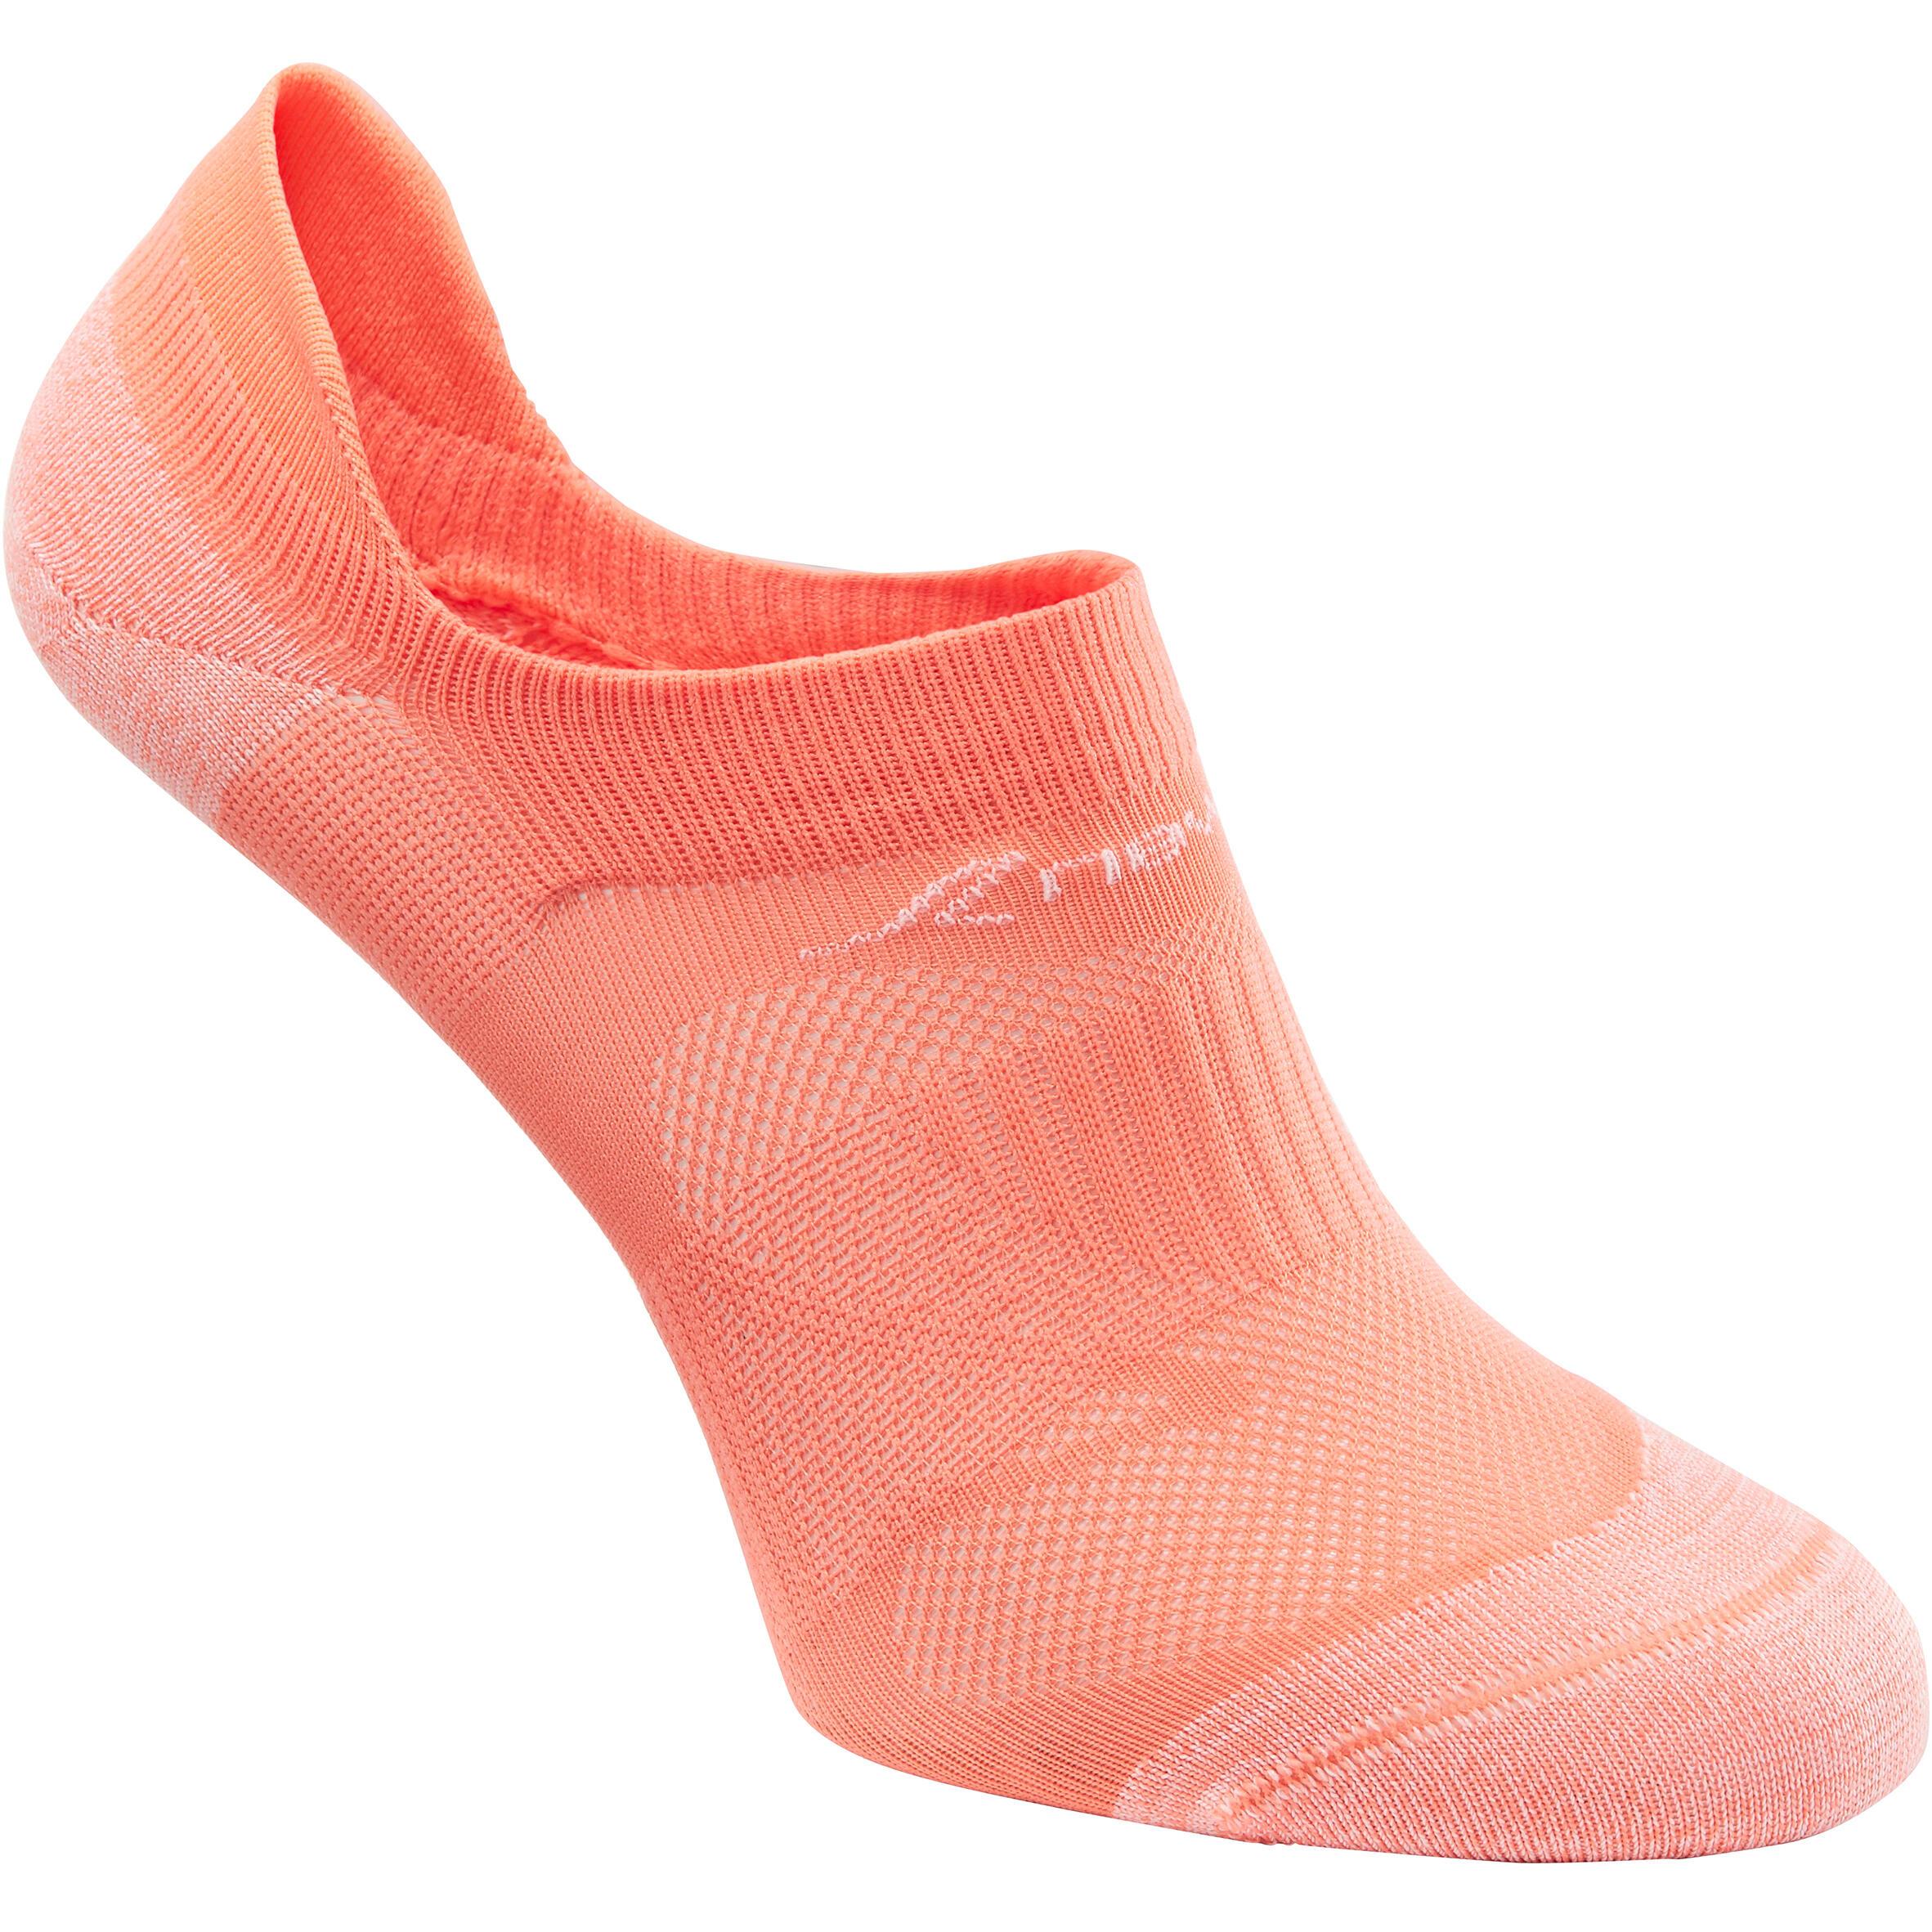 SK 500 Fresh Invisible Fitness Walking Socks - Coral